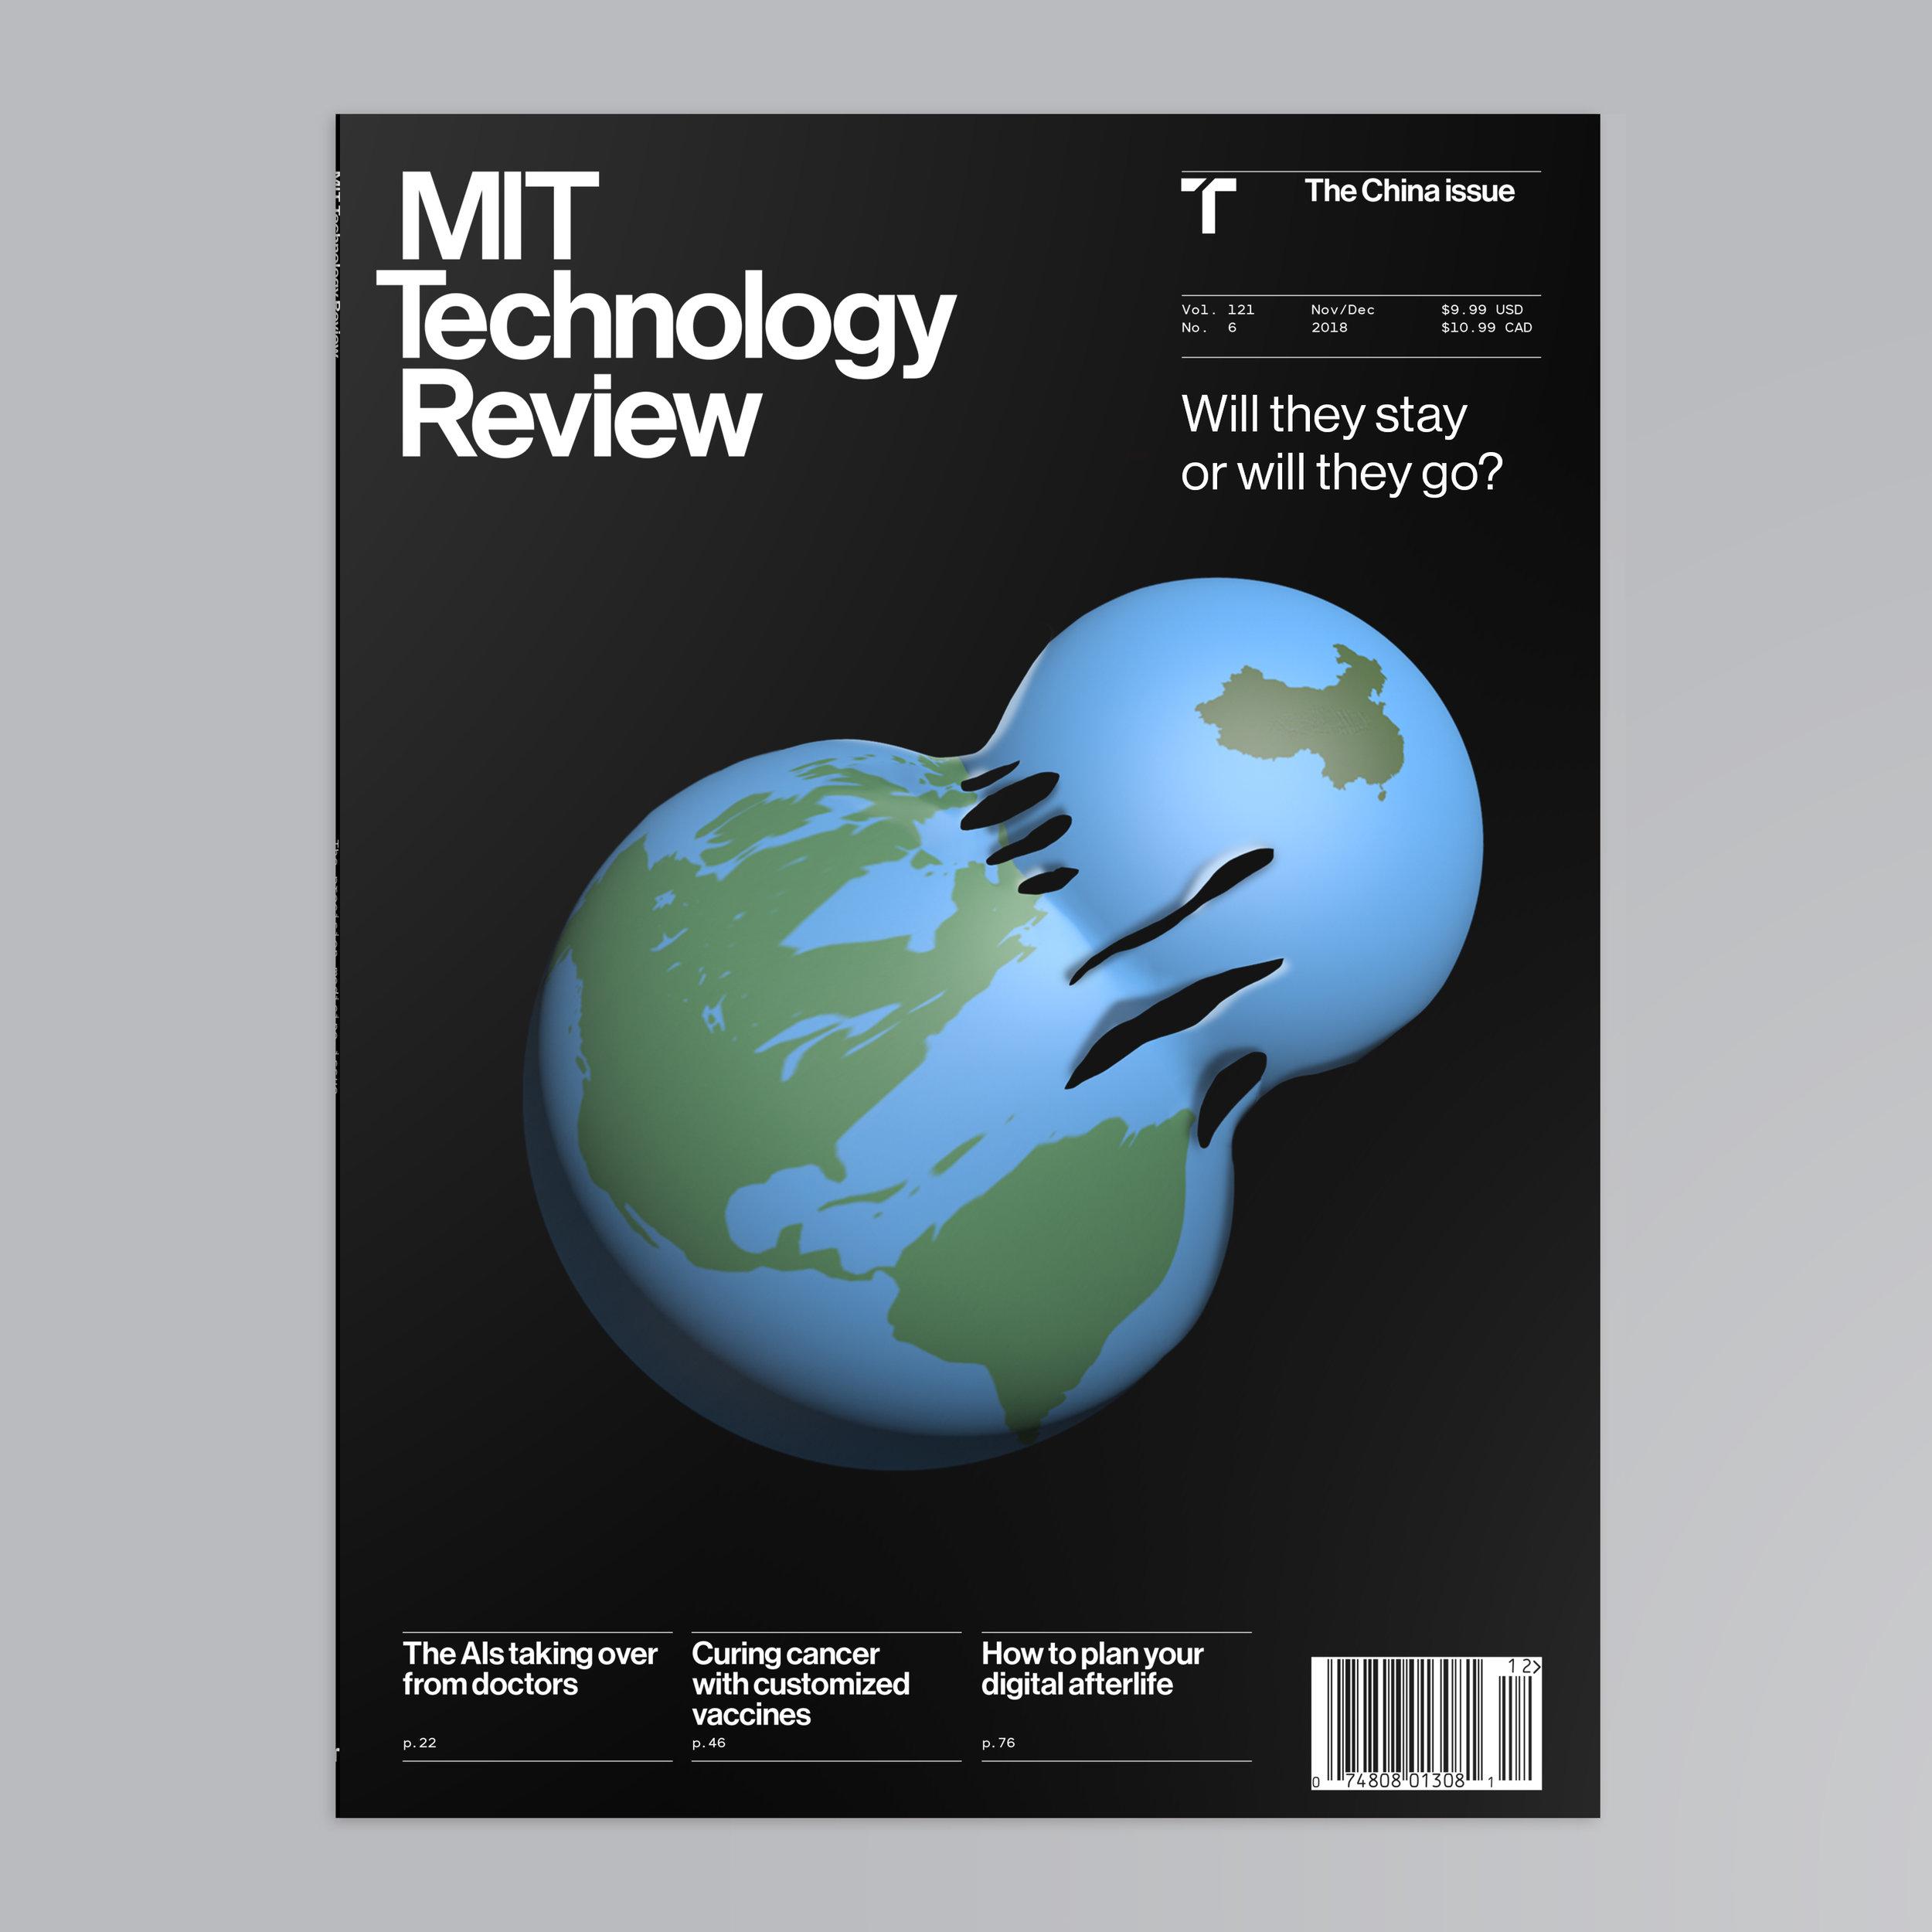 MIT_TECH_delcancompany_V1.jpg